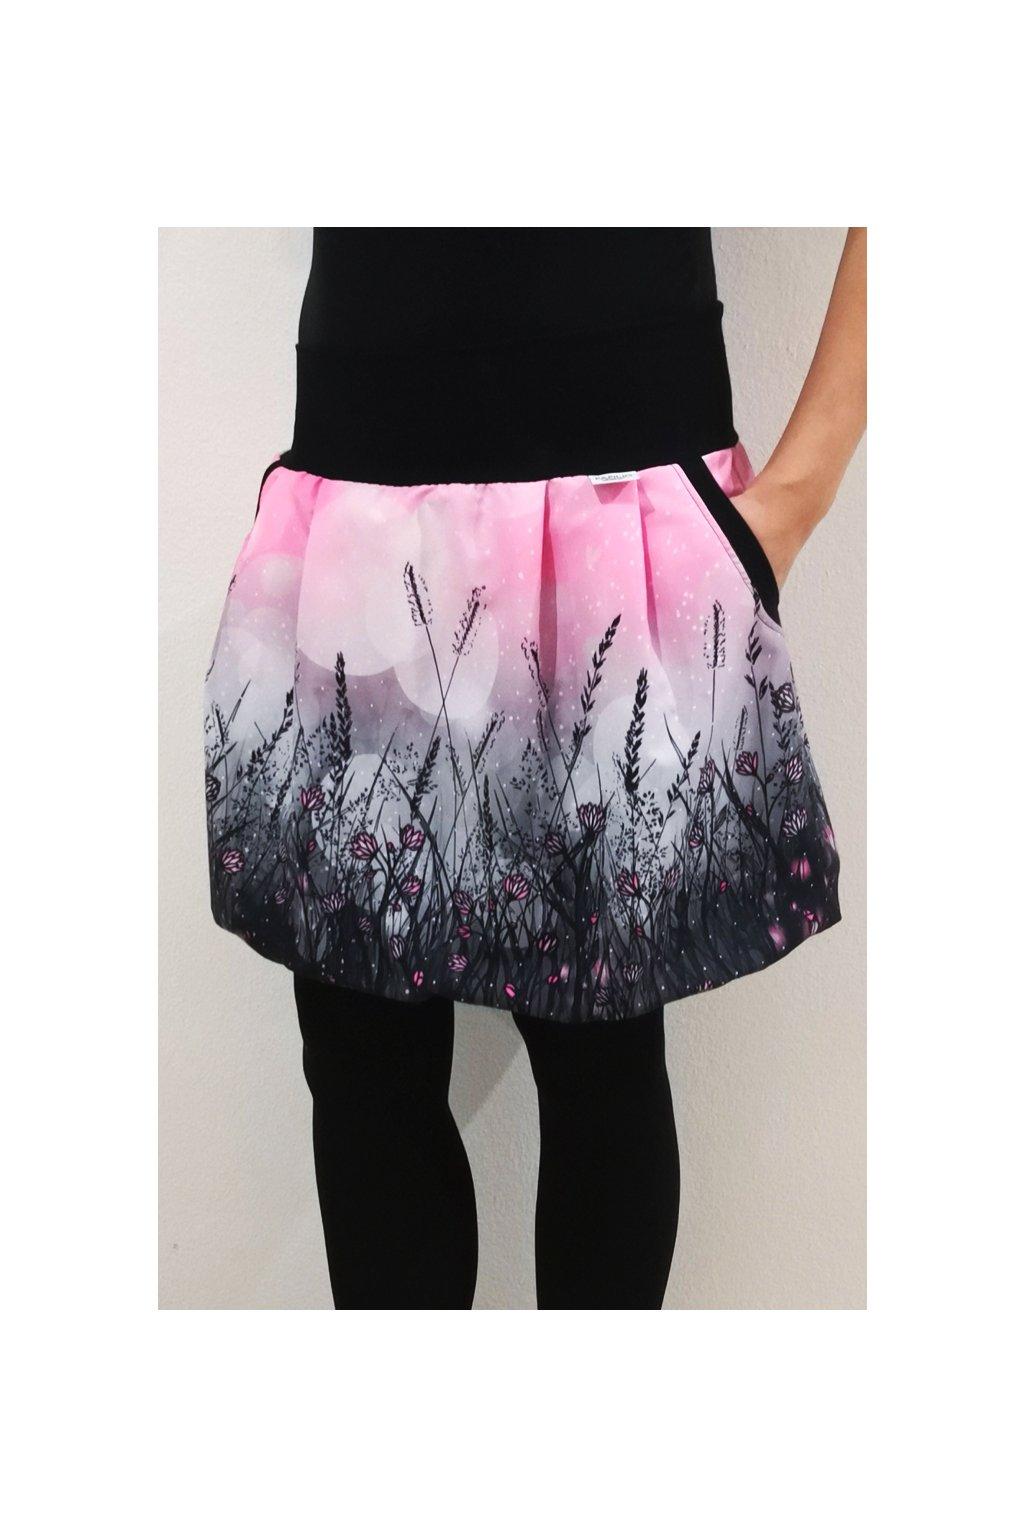 SKLADEM - Balonová sukně Jaro, růžová | micropeach